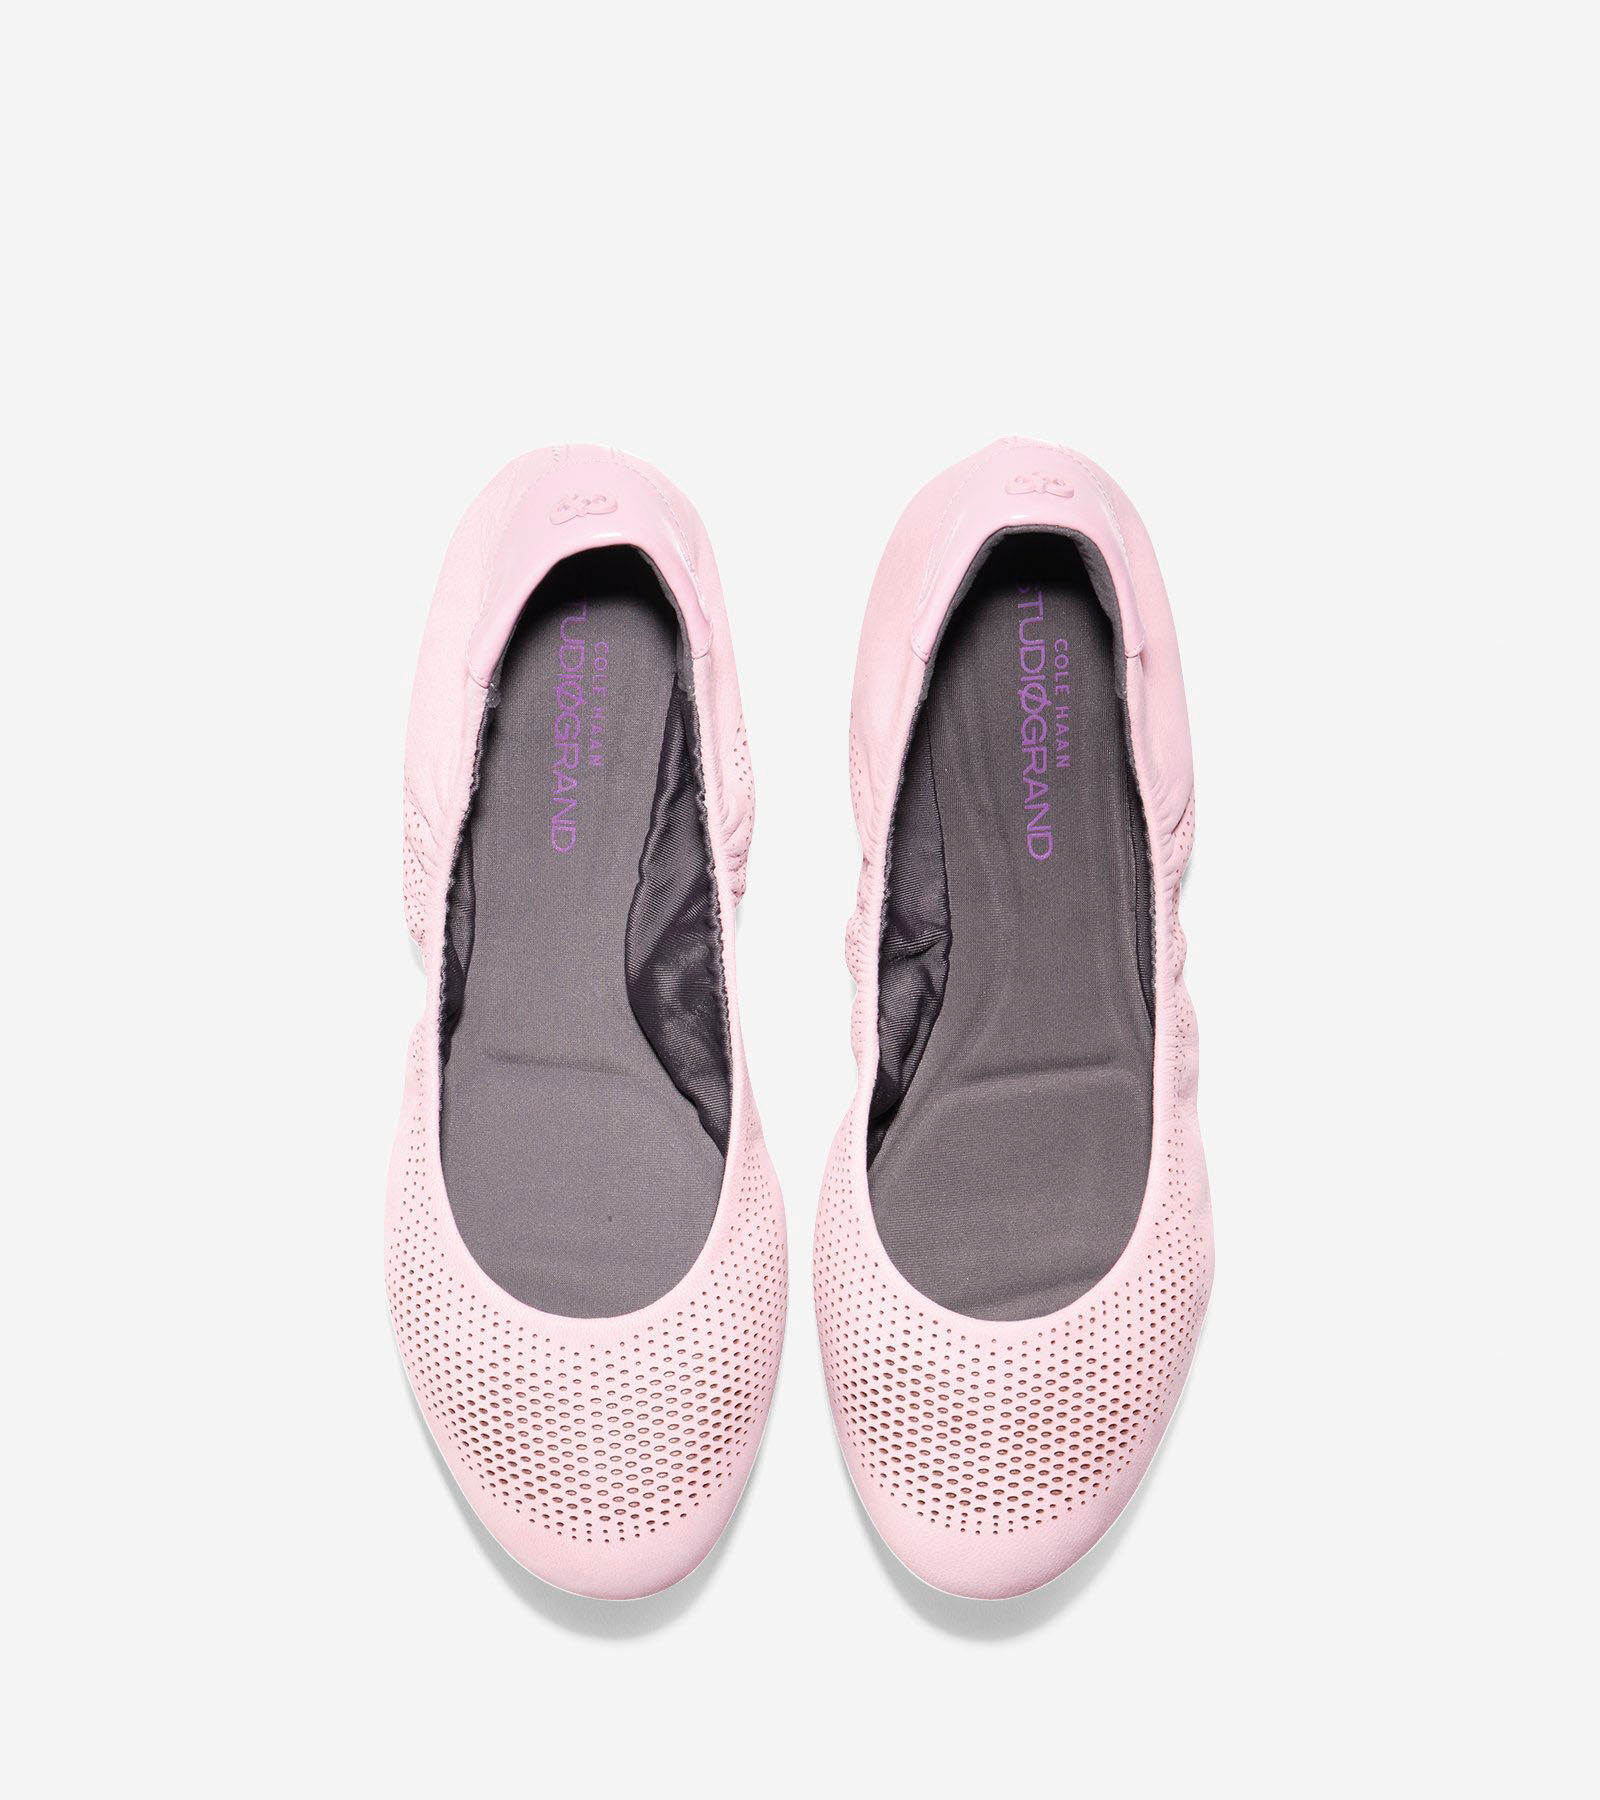 StudioGrand Packable Ballet Flats